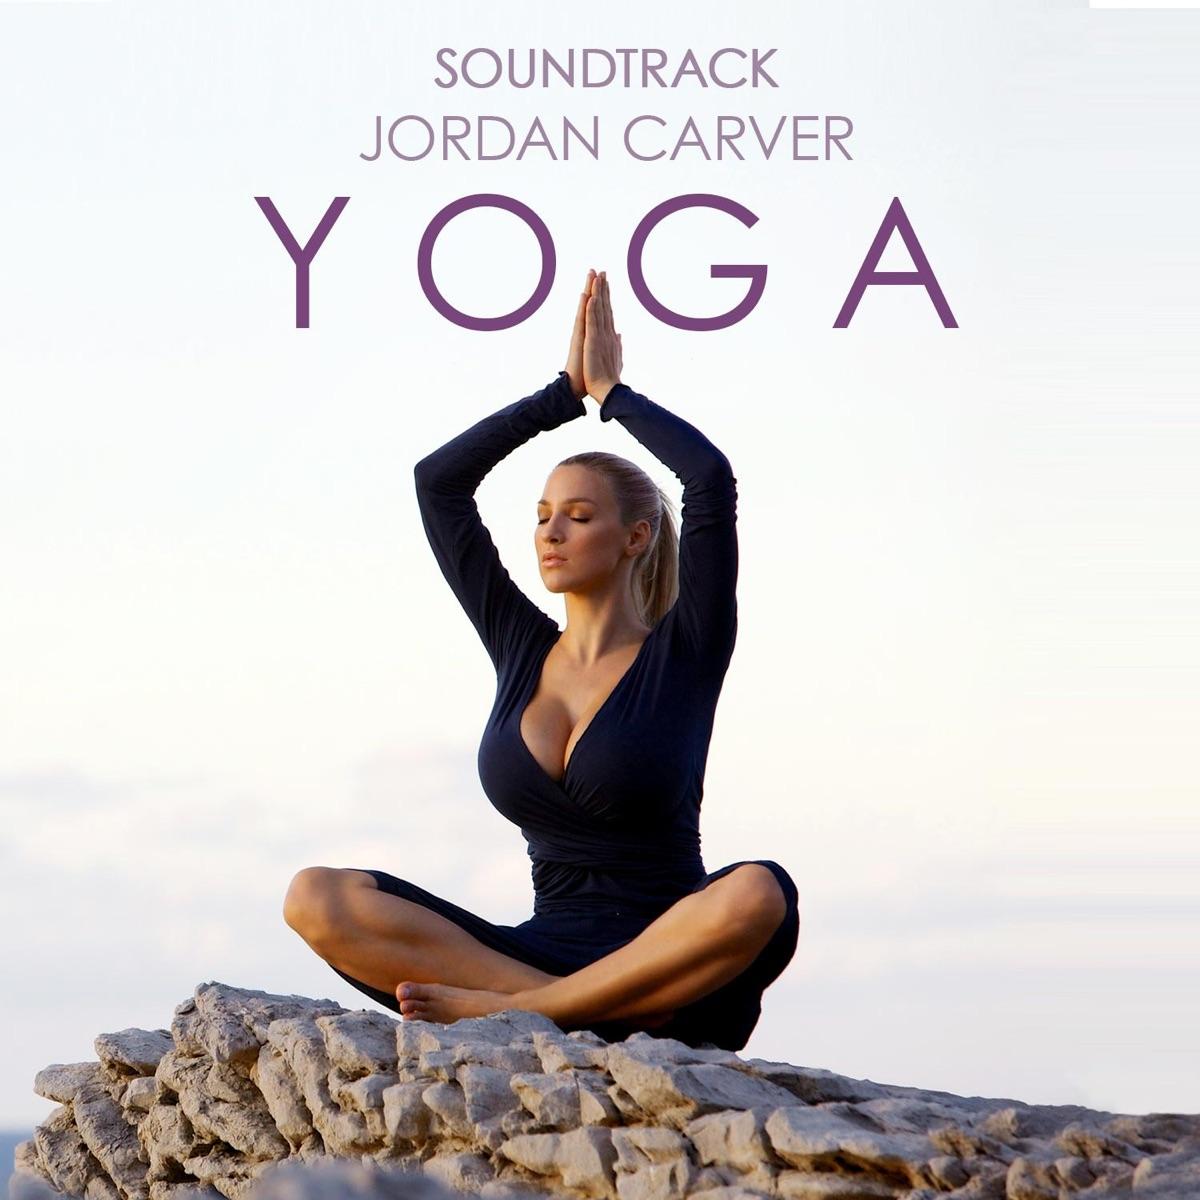 Jordan Carver Yoga DVD Soundtrack Album Cover By Sascha Ende